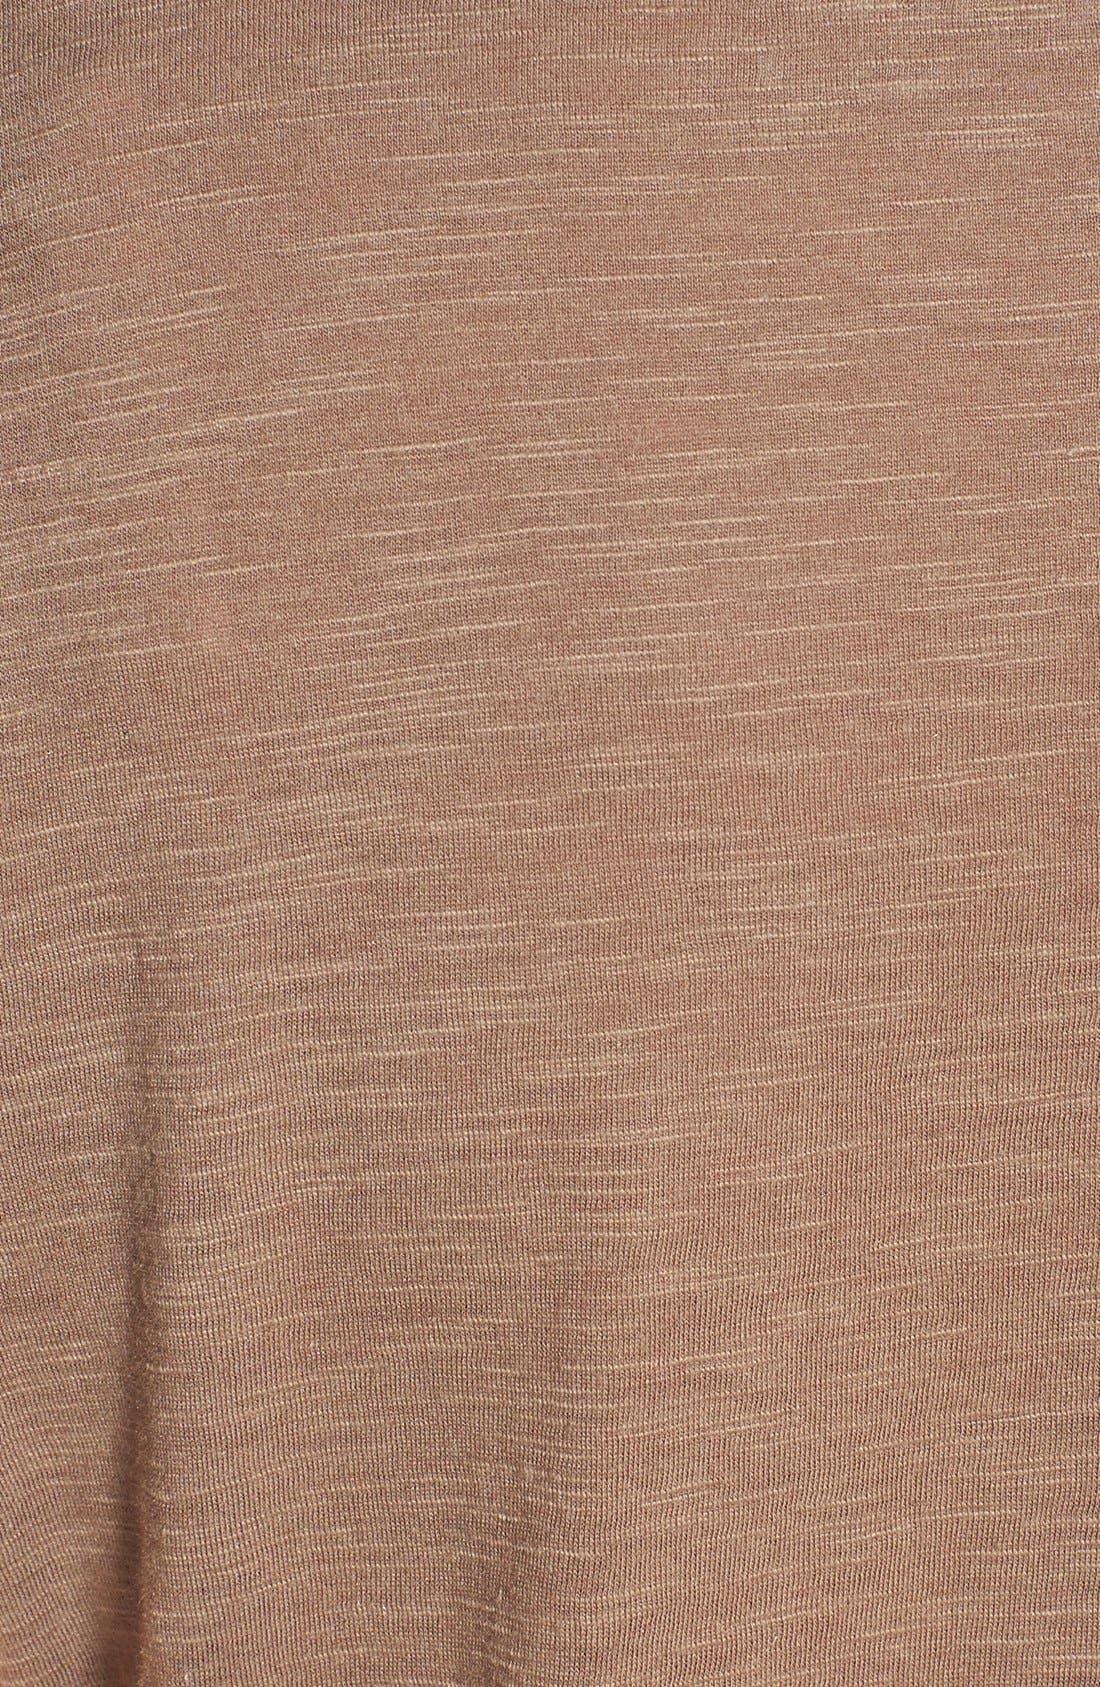 Short Sleeve Cotton & Modal Tee,                             Alternate thumbnail 32, color,